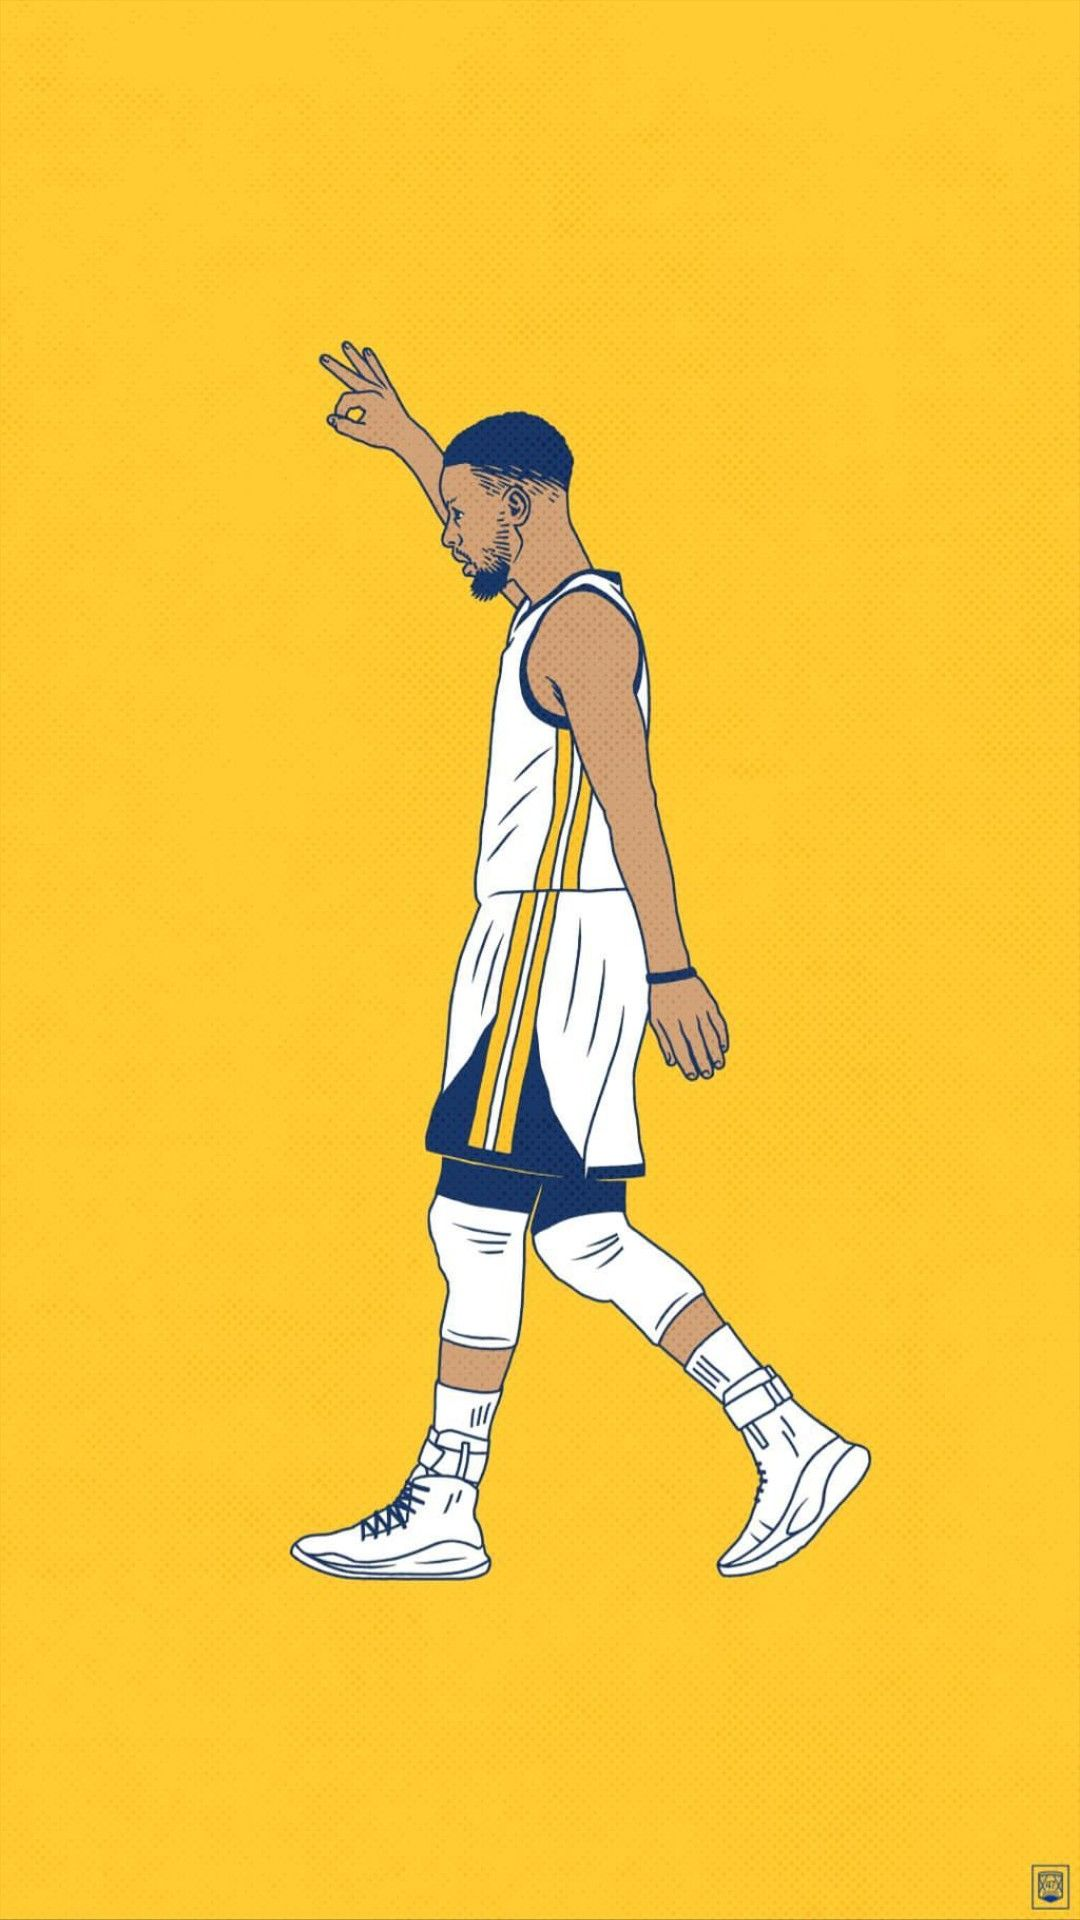 Stephen Curry Wallpaper Curry Nba Nba Stephen Curry Nba Basketball Art